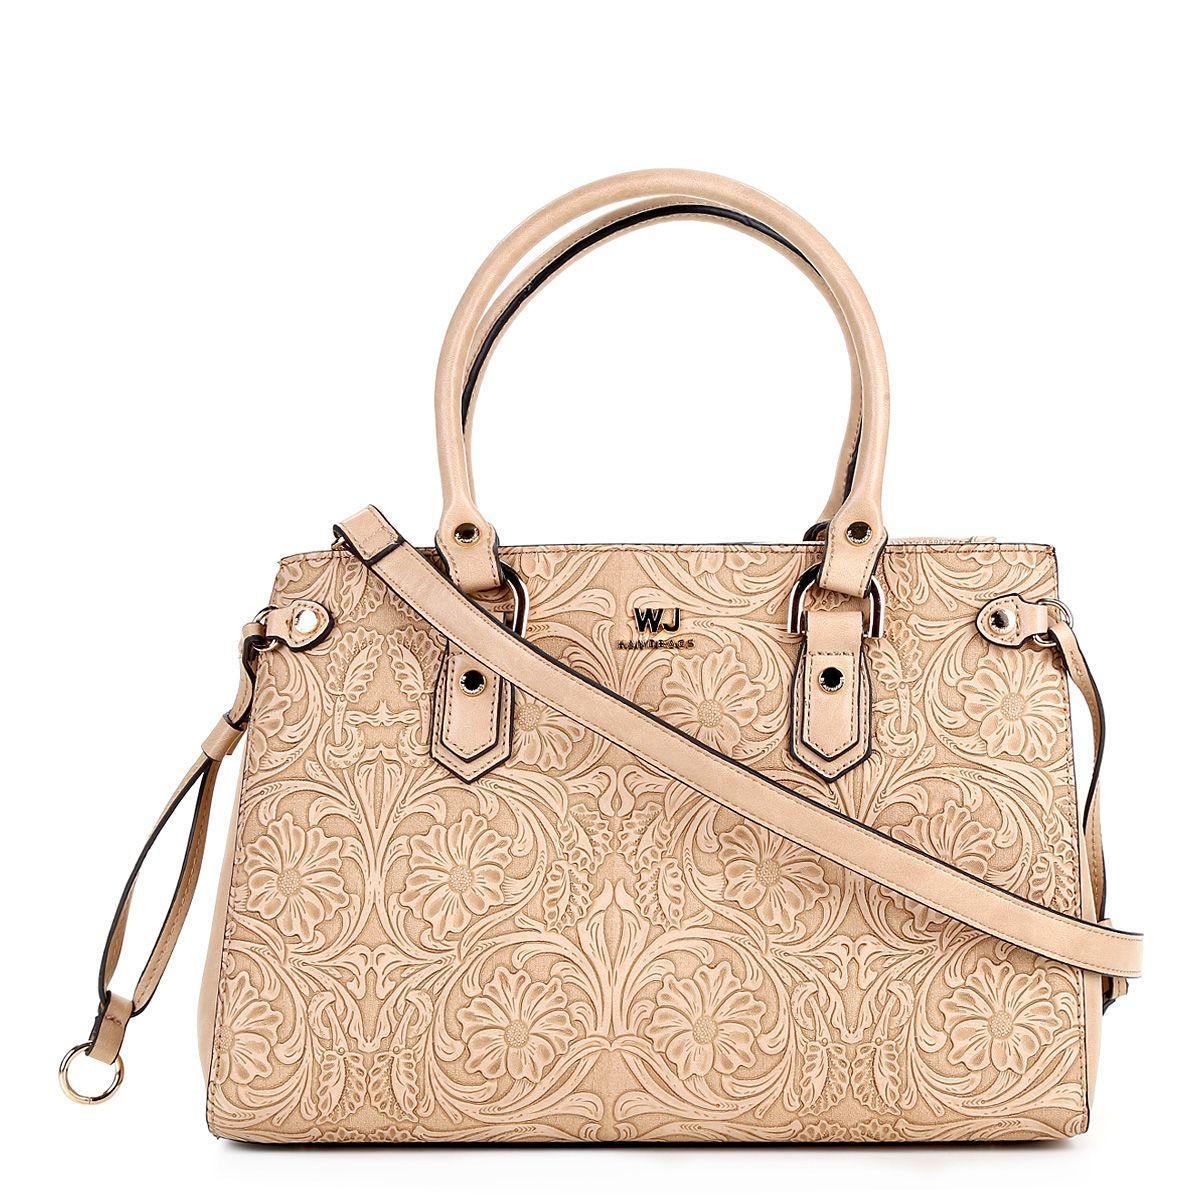 c7ed6b70f Bolsa WJ Shopper Satchel Feminina - Bege - Compre Agora | Zattini ...